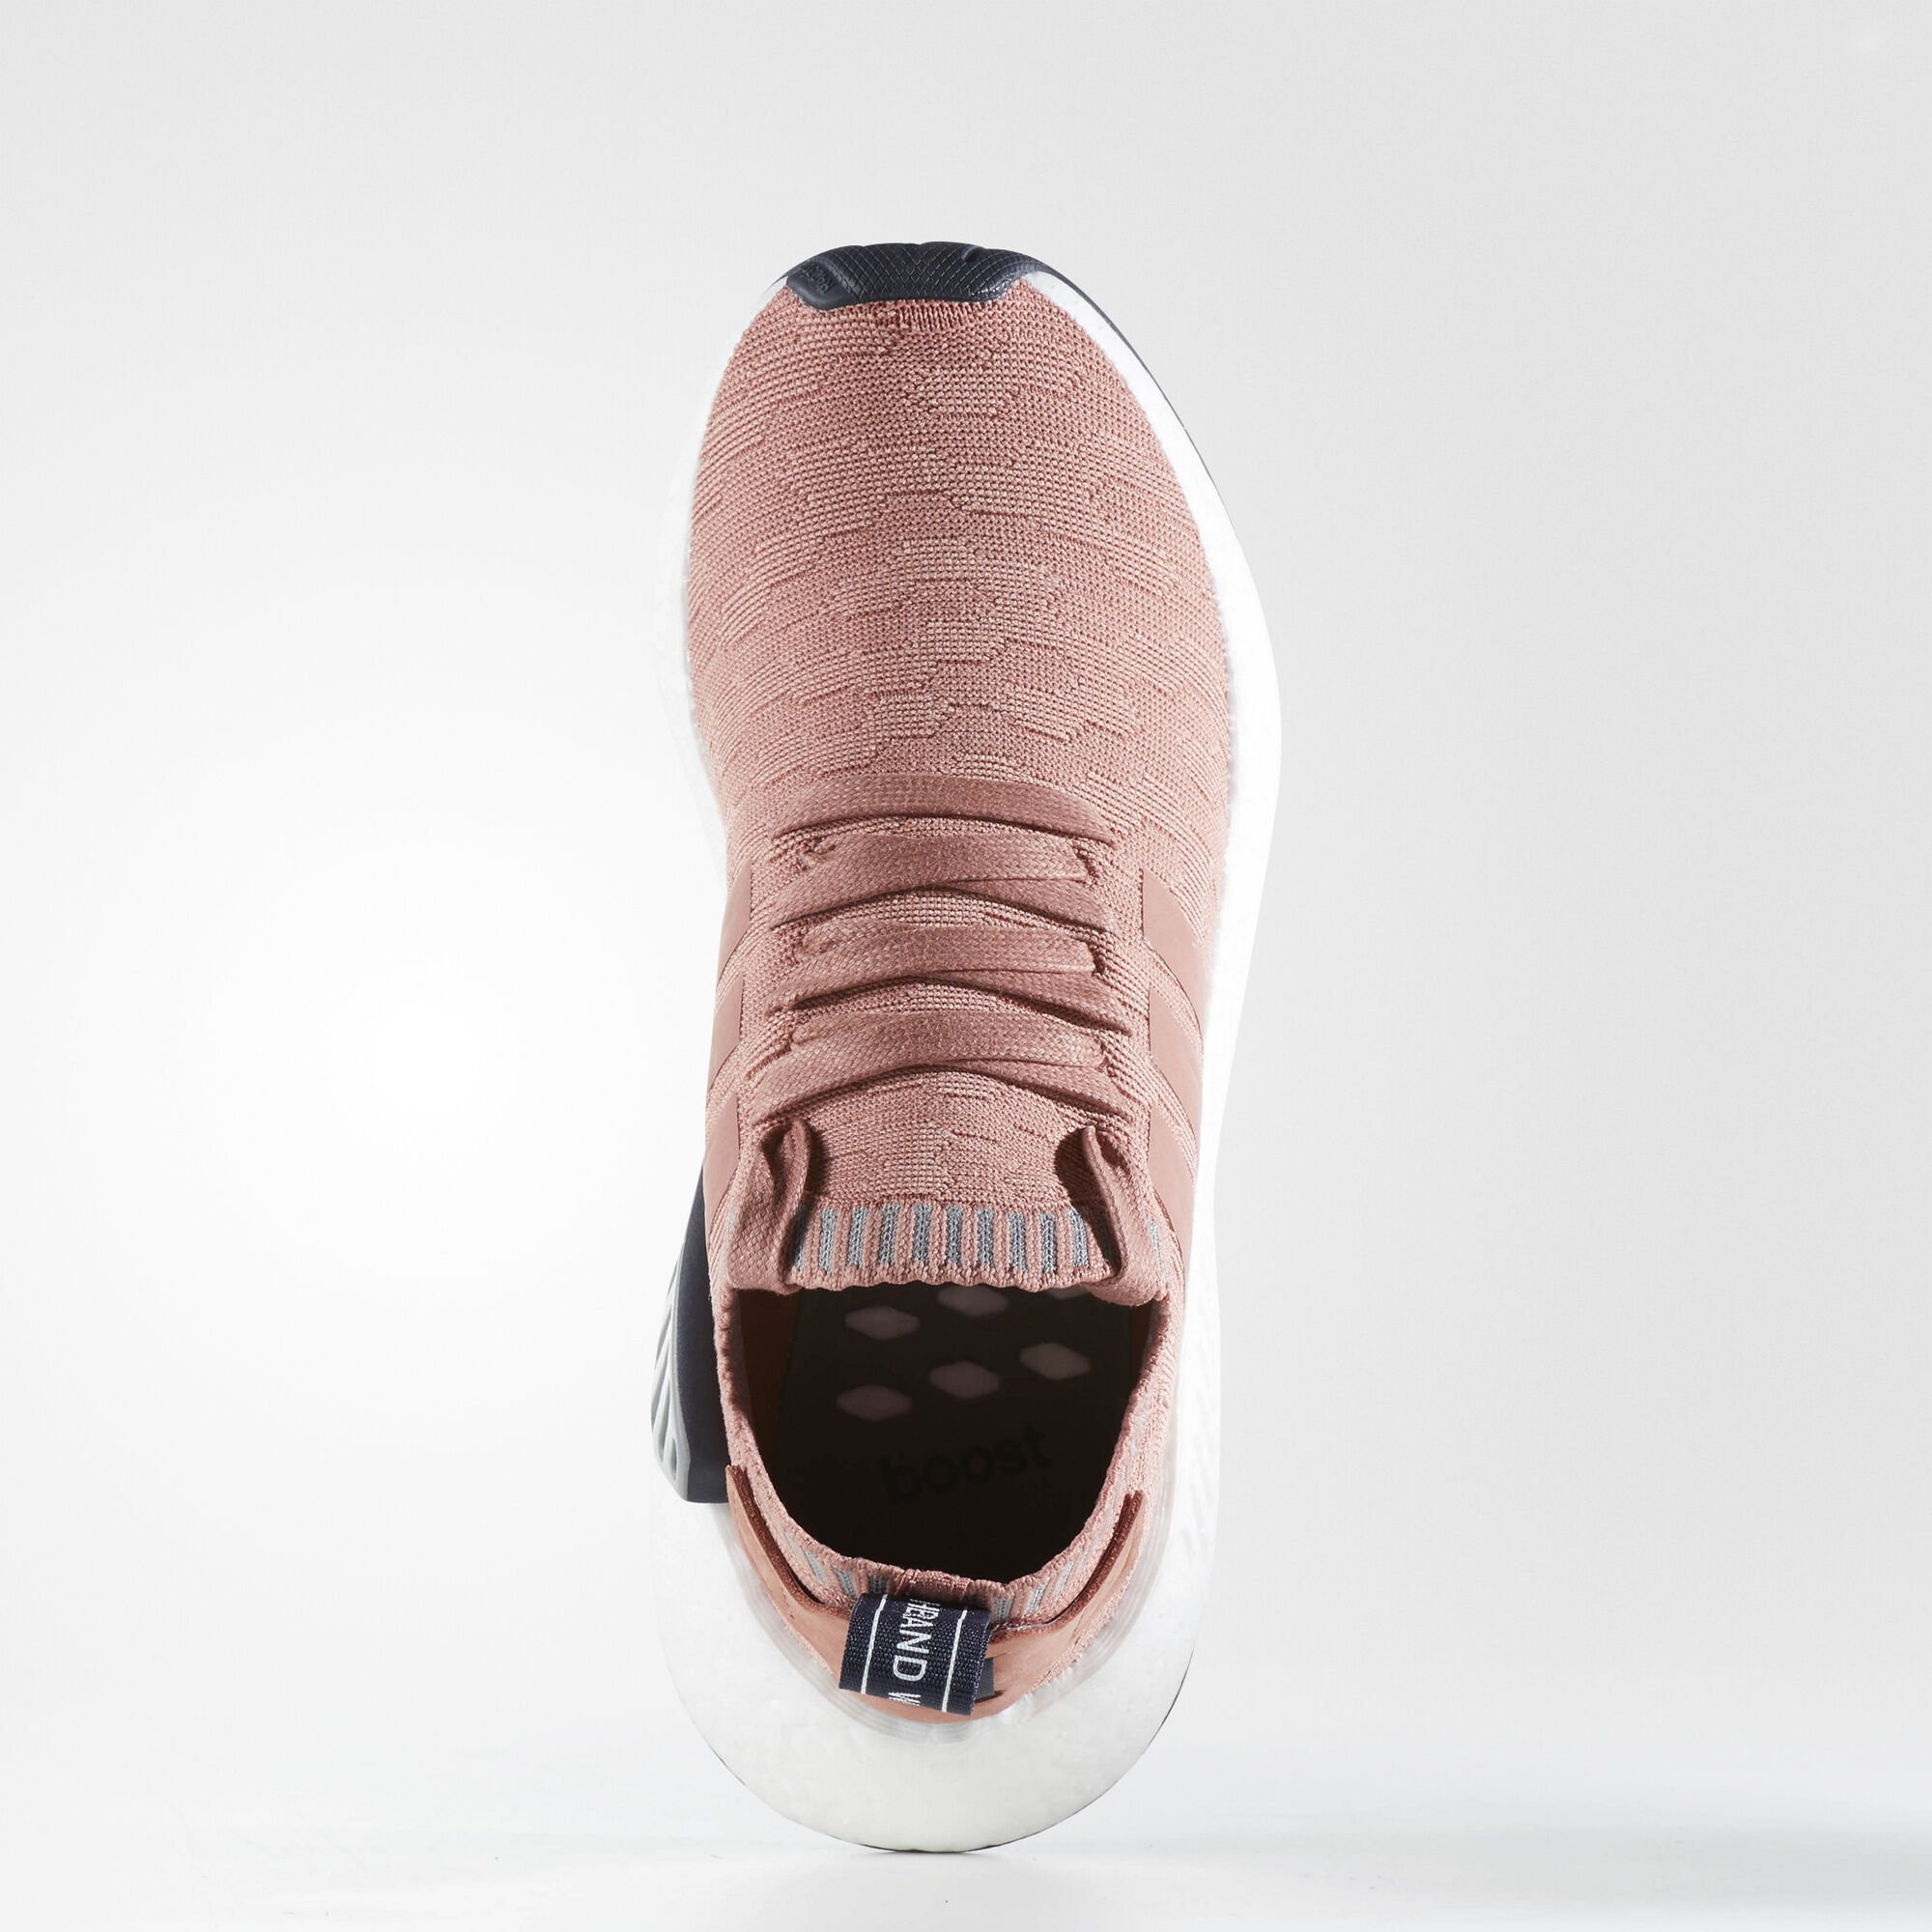 adidas NMD R2 Raw Pink (W) (BY8782)